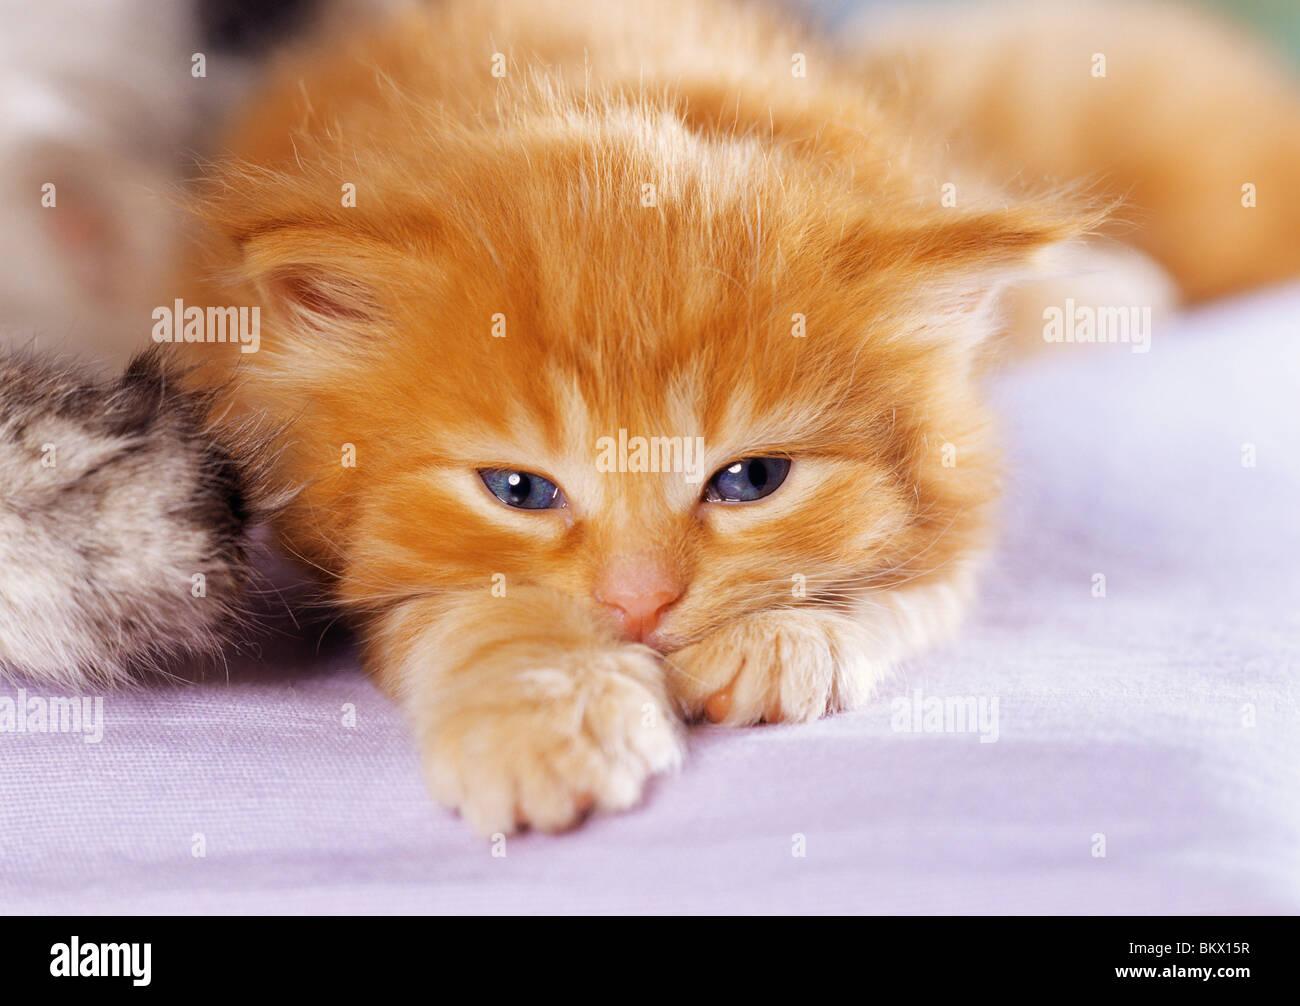 domestic kitten - Stock Image